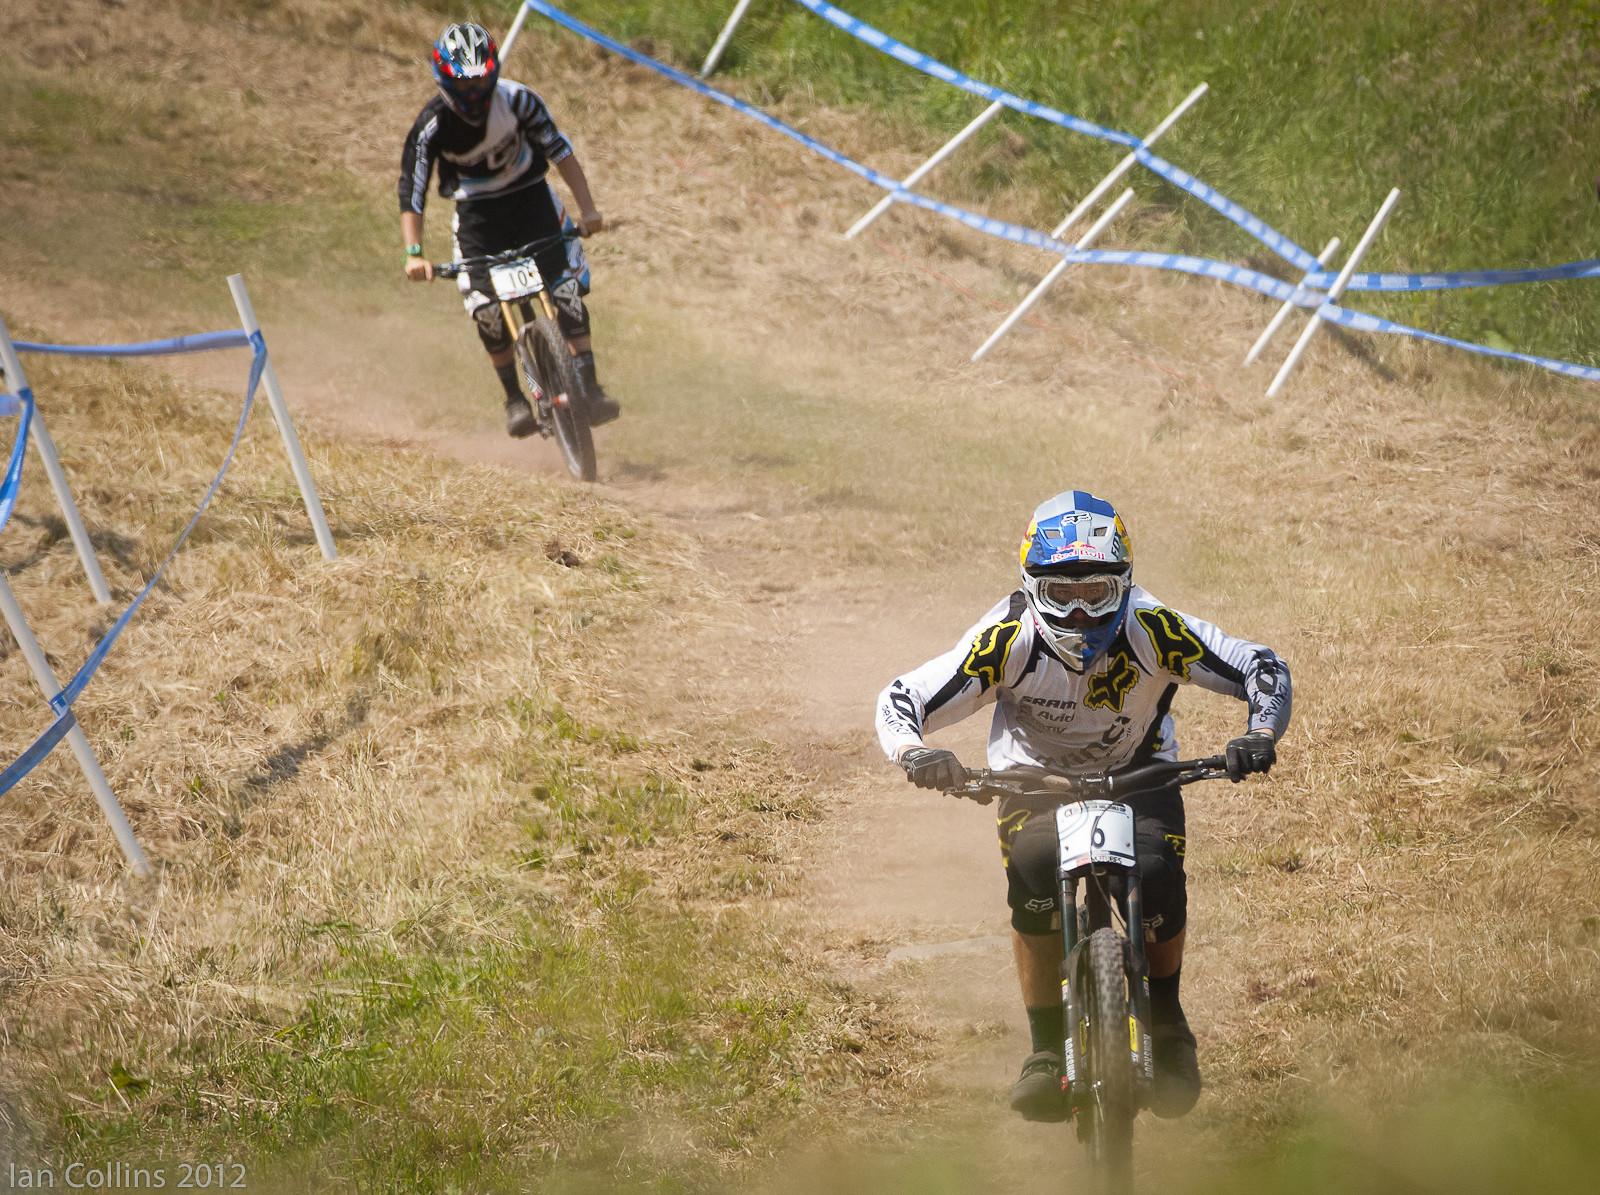 Steve Smith/Sam Blenkinsop  - Ian Collins - Mountain Biking Pictures - Vital MTB